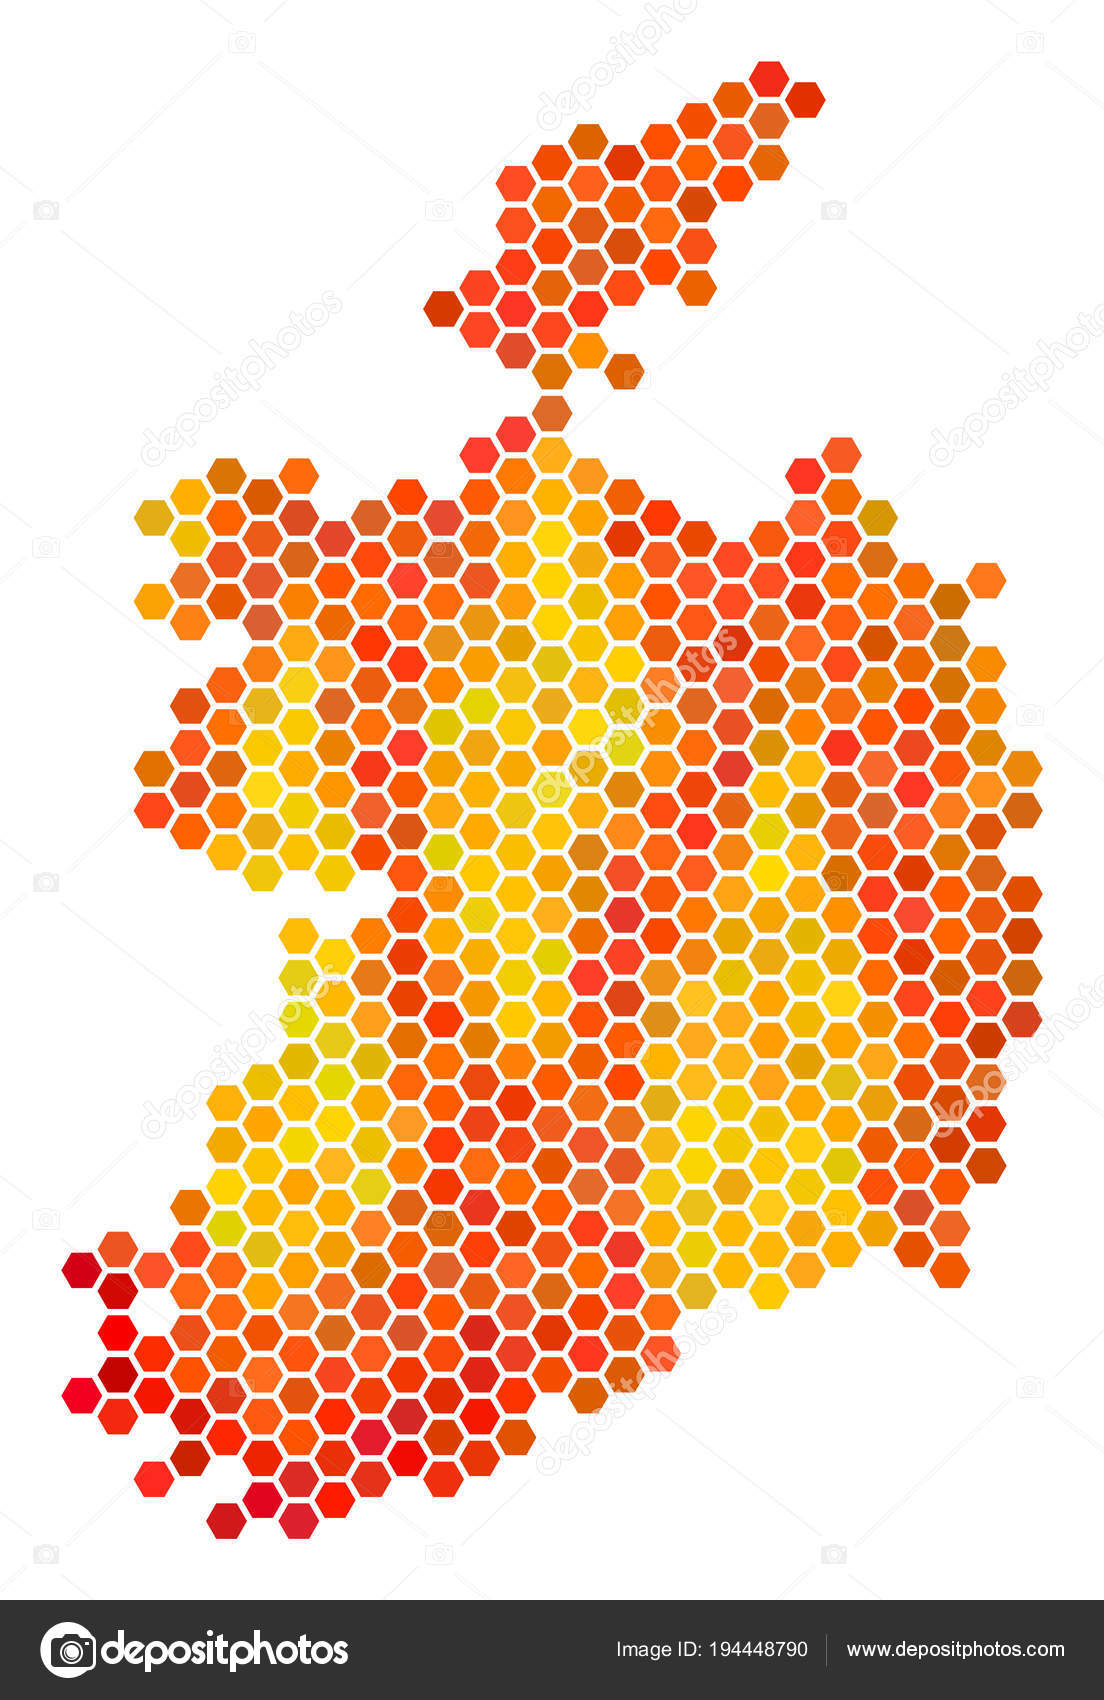 orange hexagon ireland republic map stock vector ahasoft 194448790